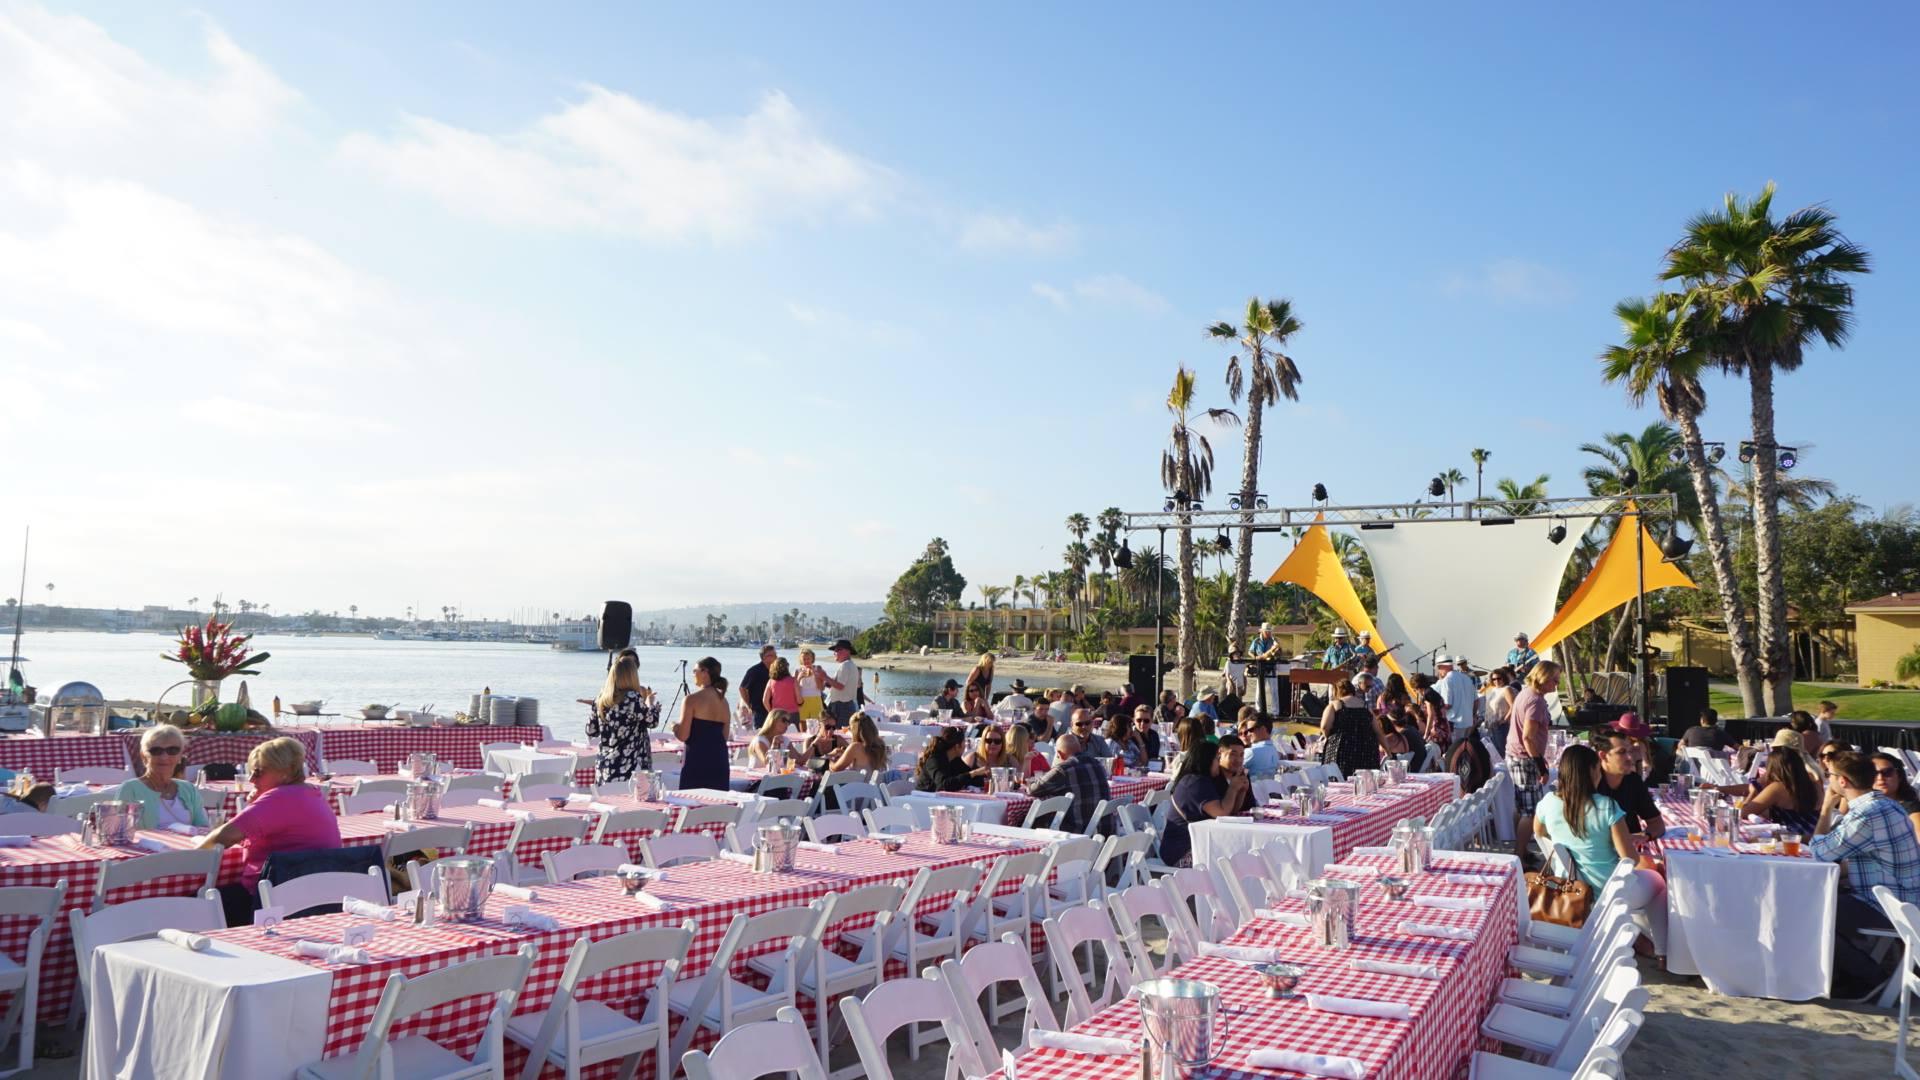 Bbq Places In Long Beach California